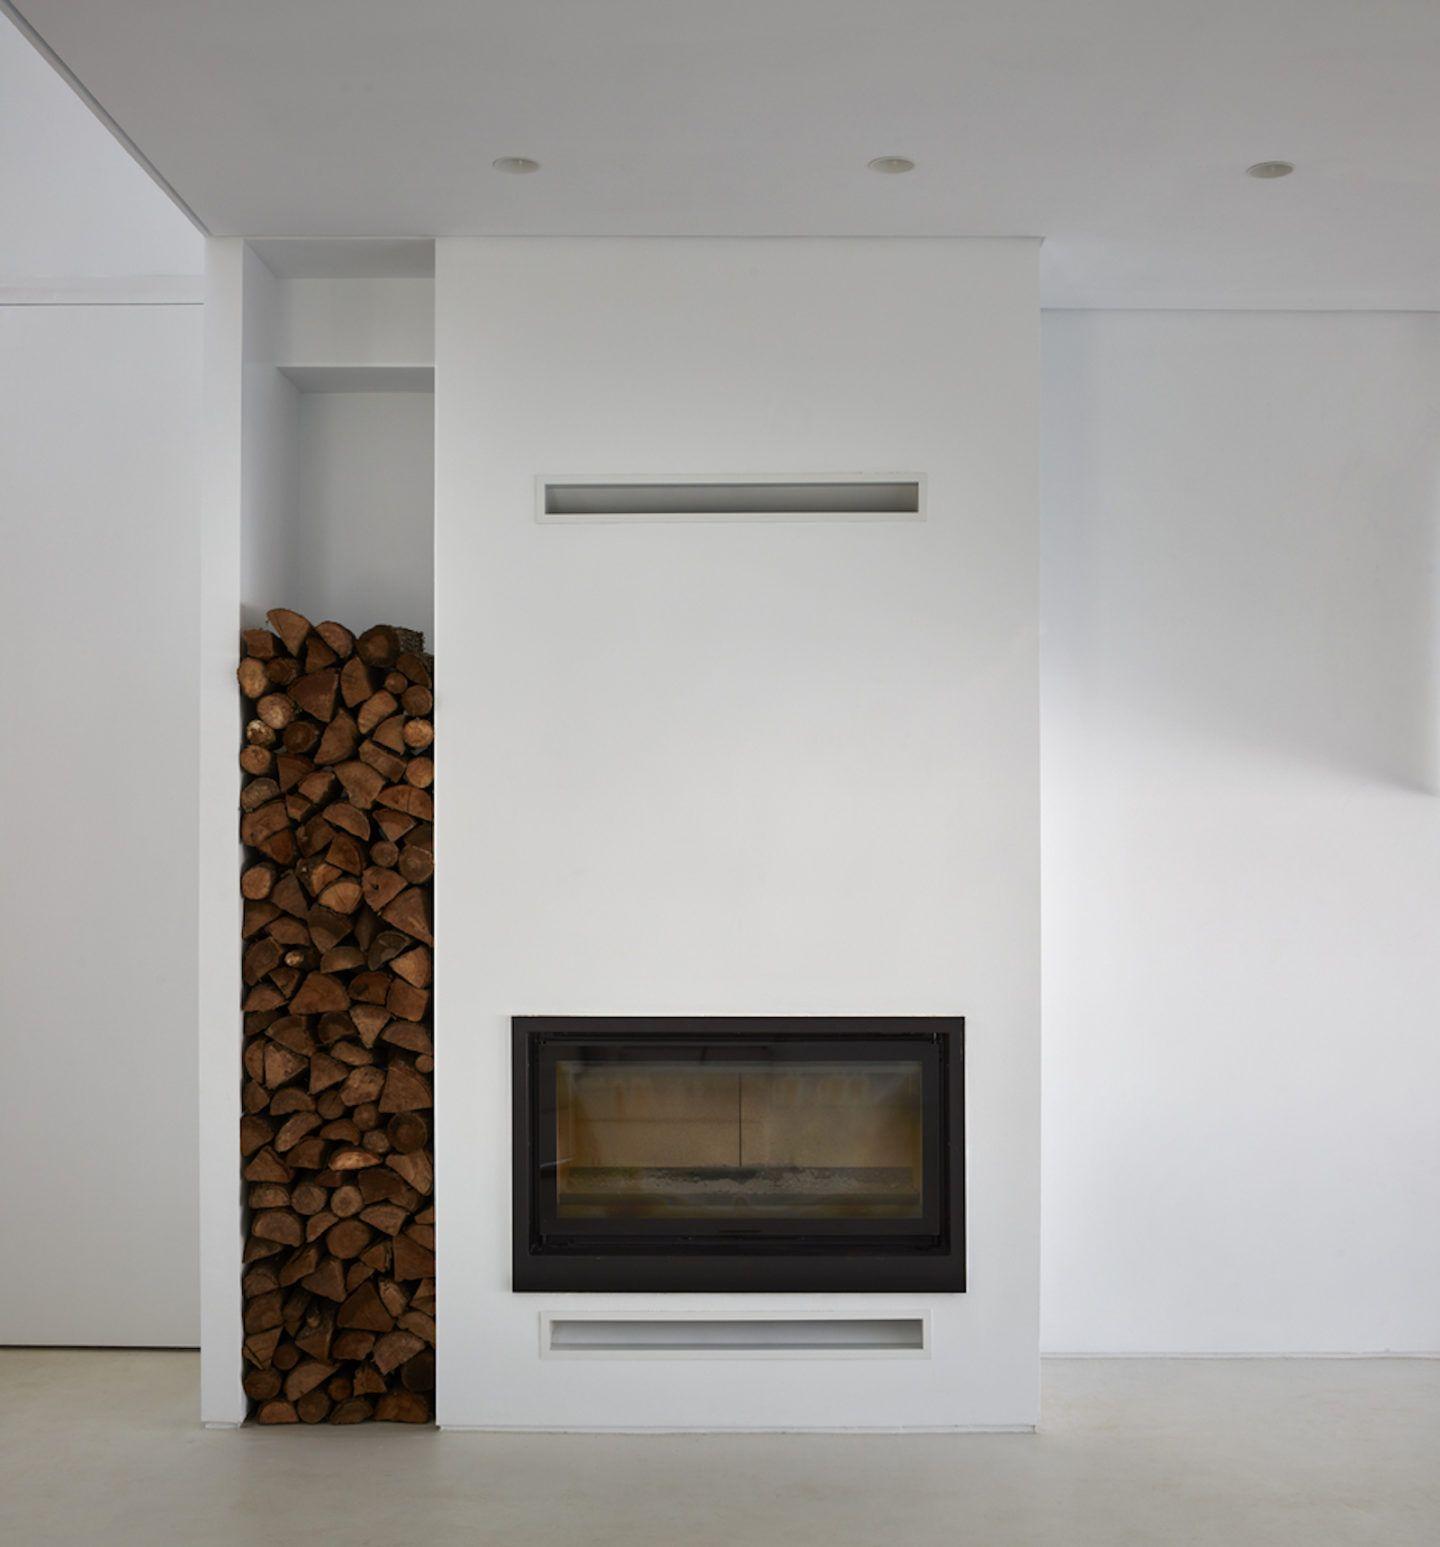 IGNANT-Architecture-Carles-Faus-Arquitectura-Carmen-House-003